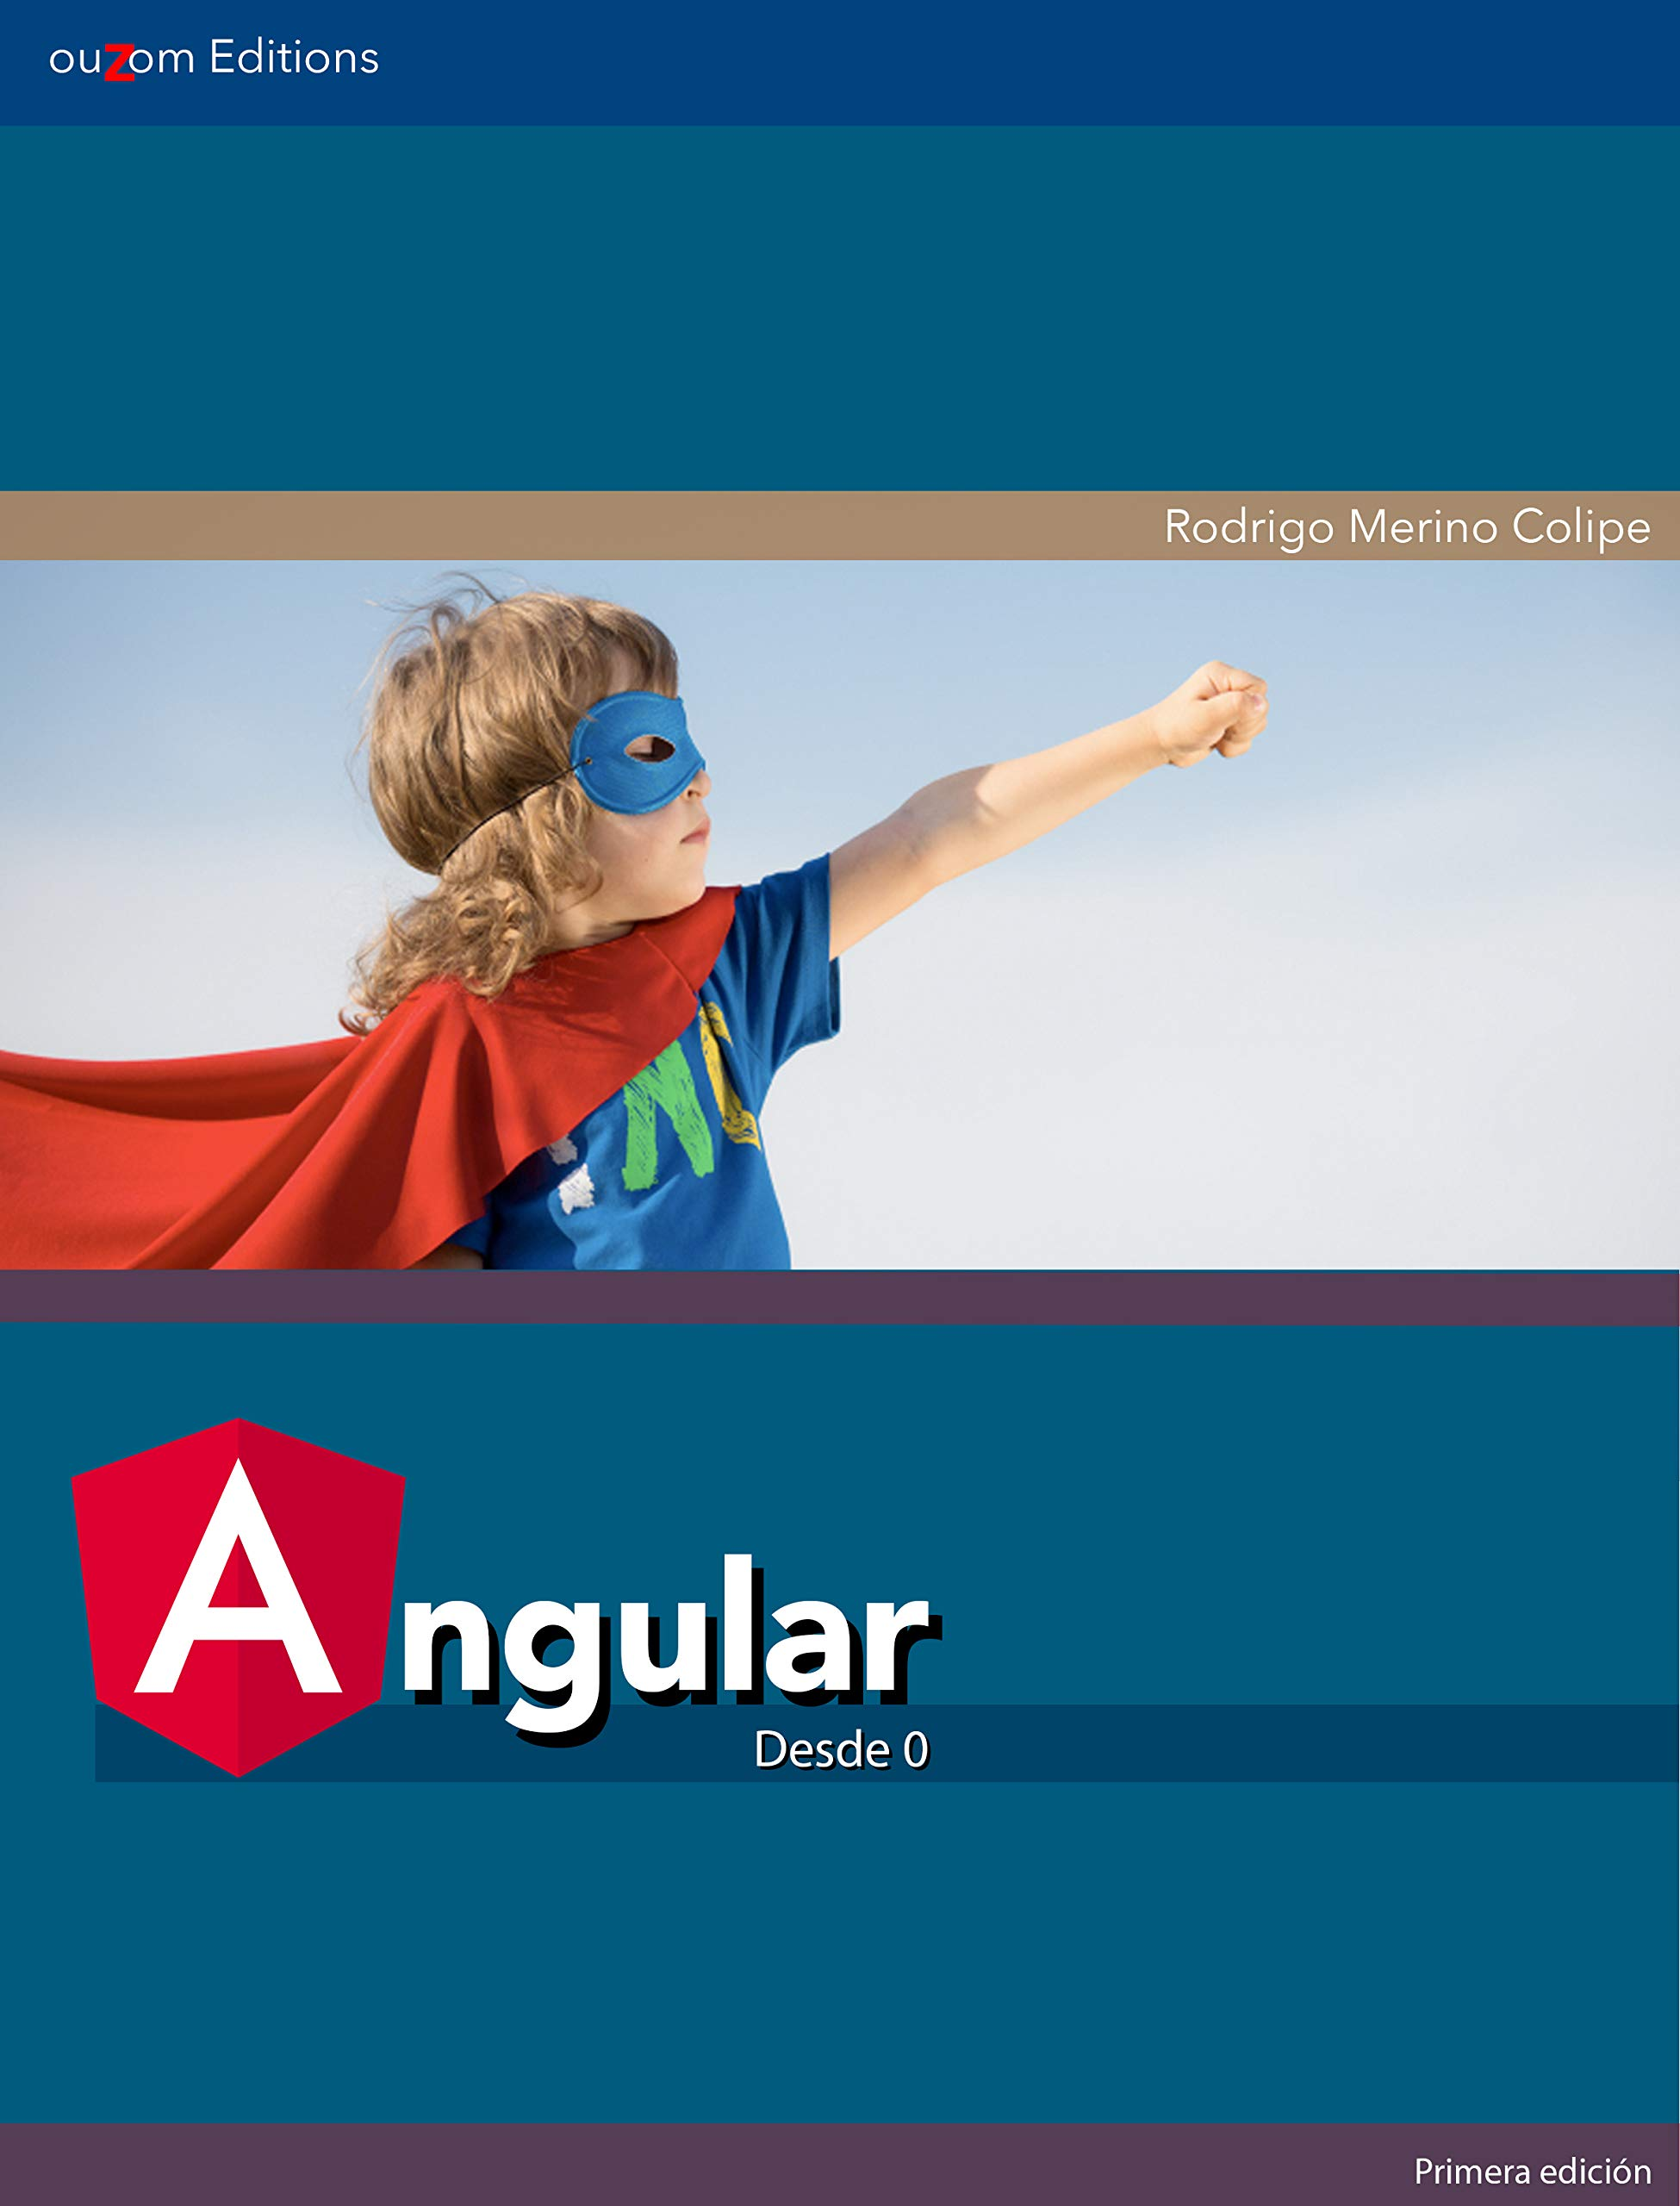 Angular desde 0: Un enfoque práctico por Rodrigo Merino